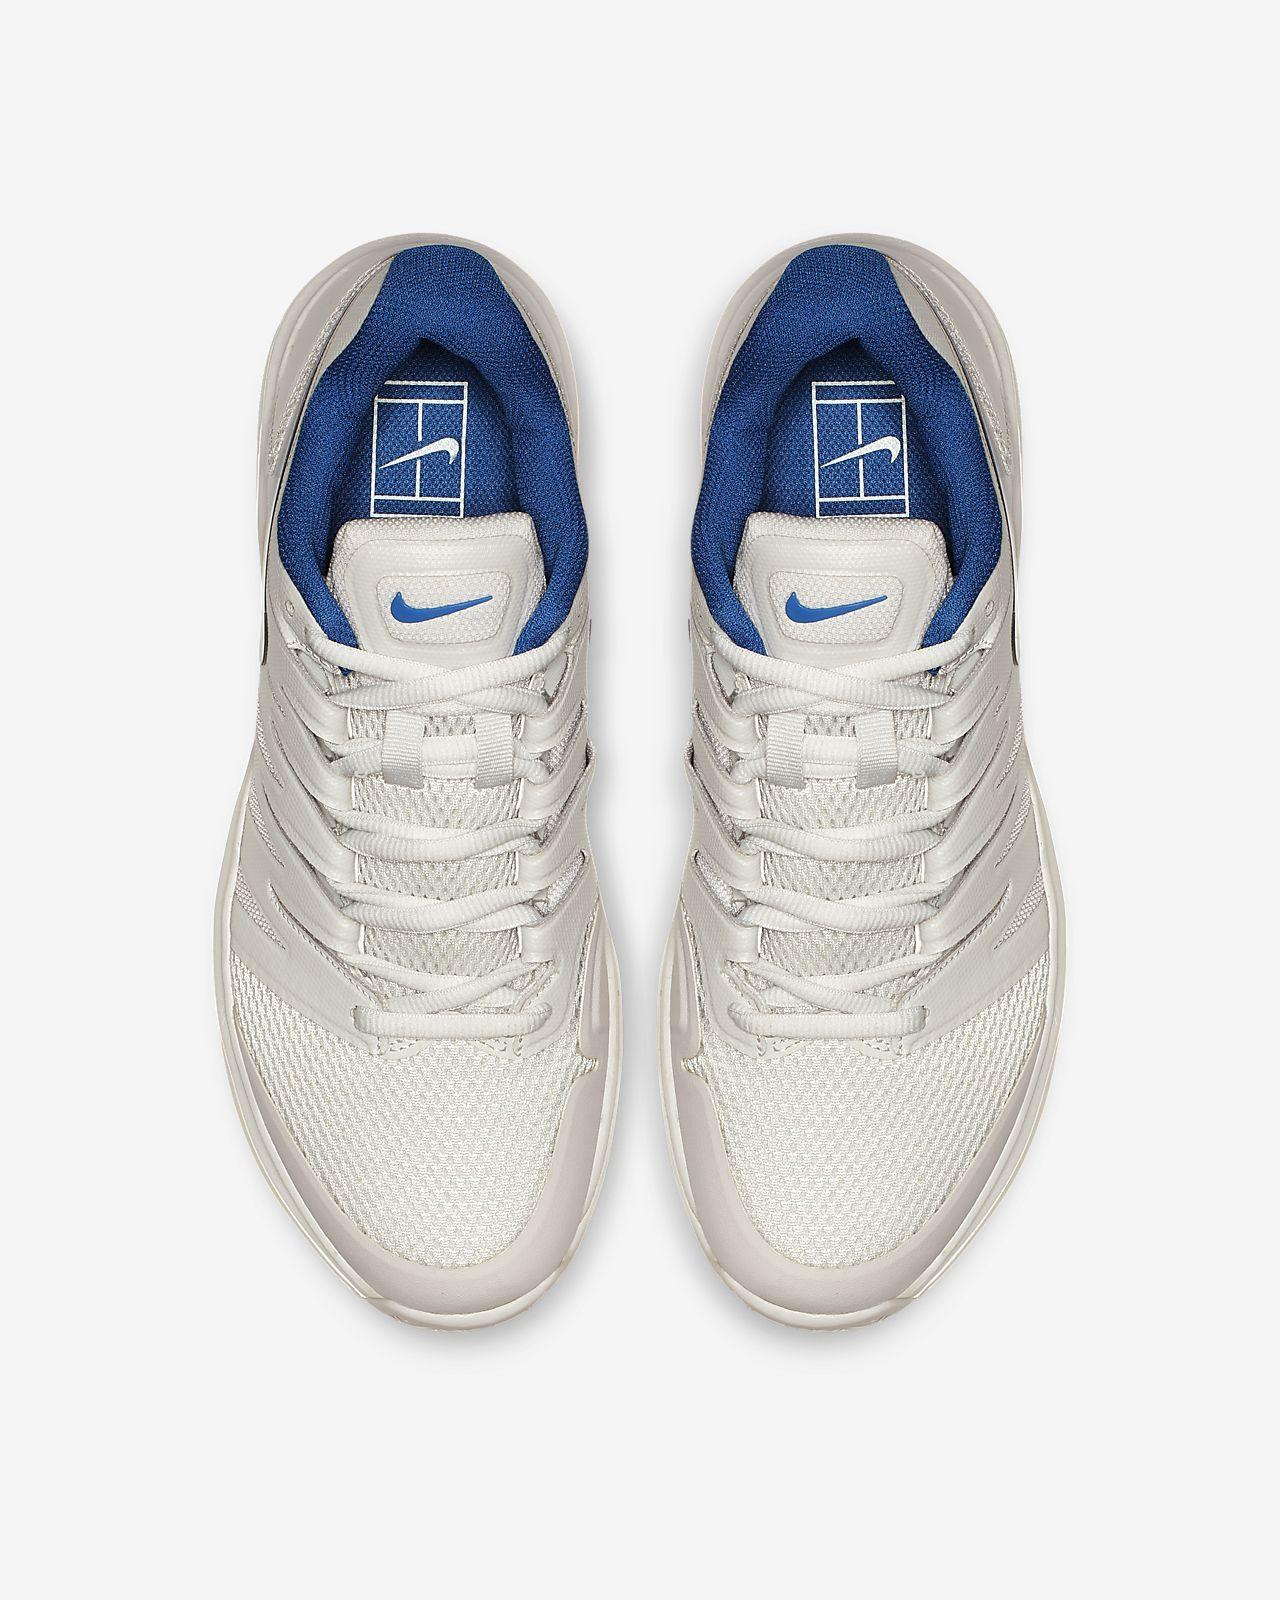 6456dc111872 NikeCourt Air Zoom Prestige Men s Hard Court Tennis Shoe. Nike.com